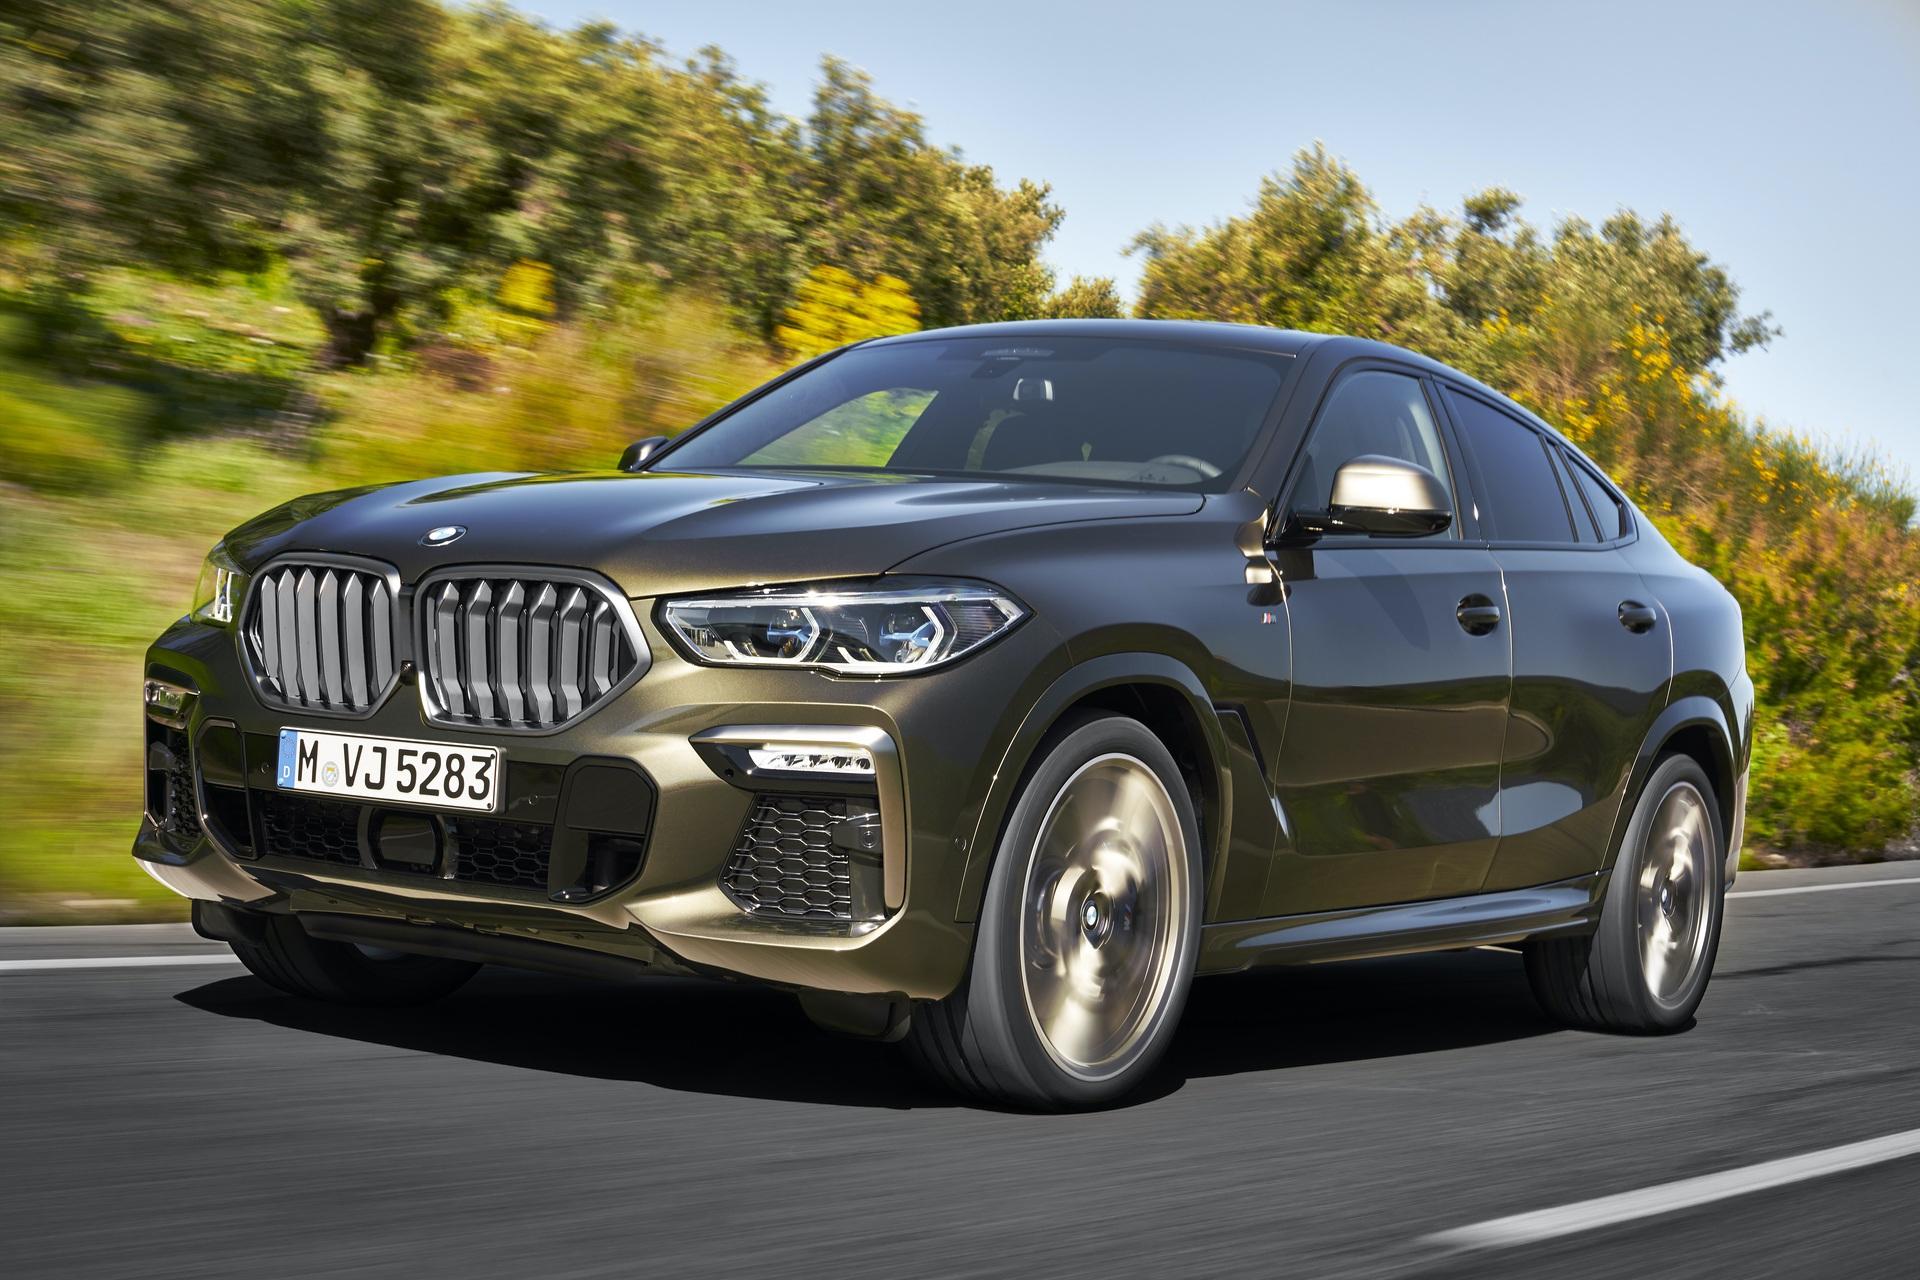 2020 BMW X6 action shots 13